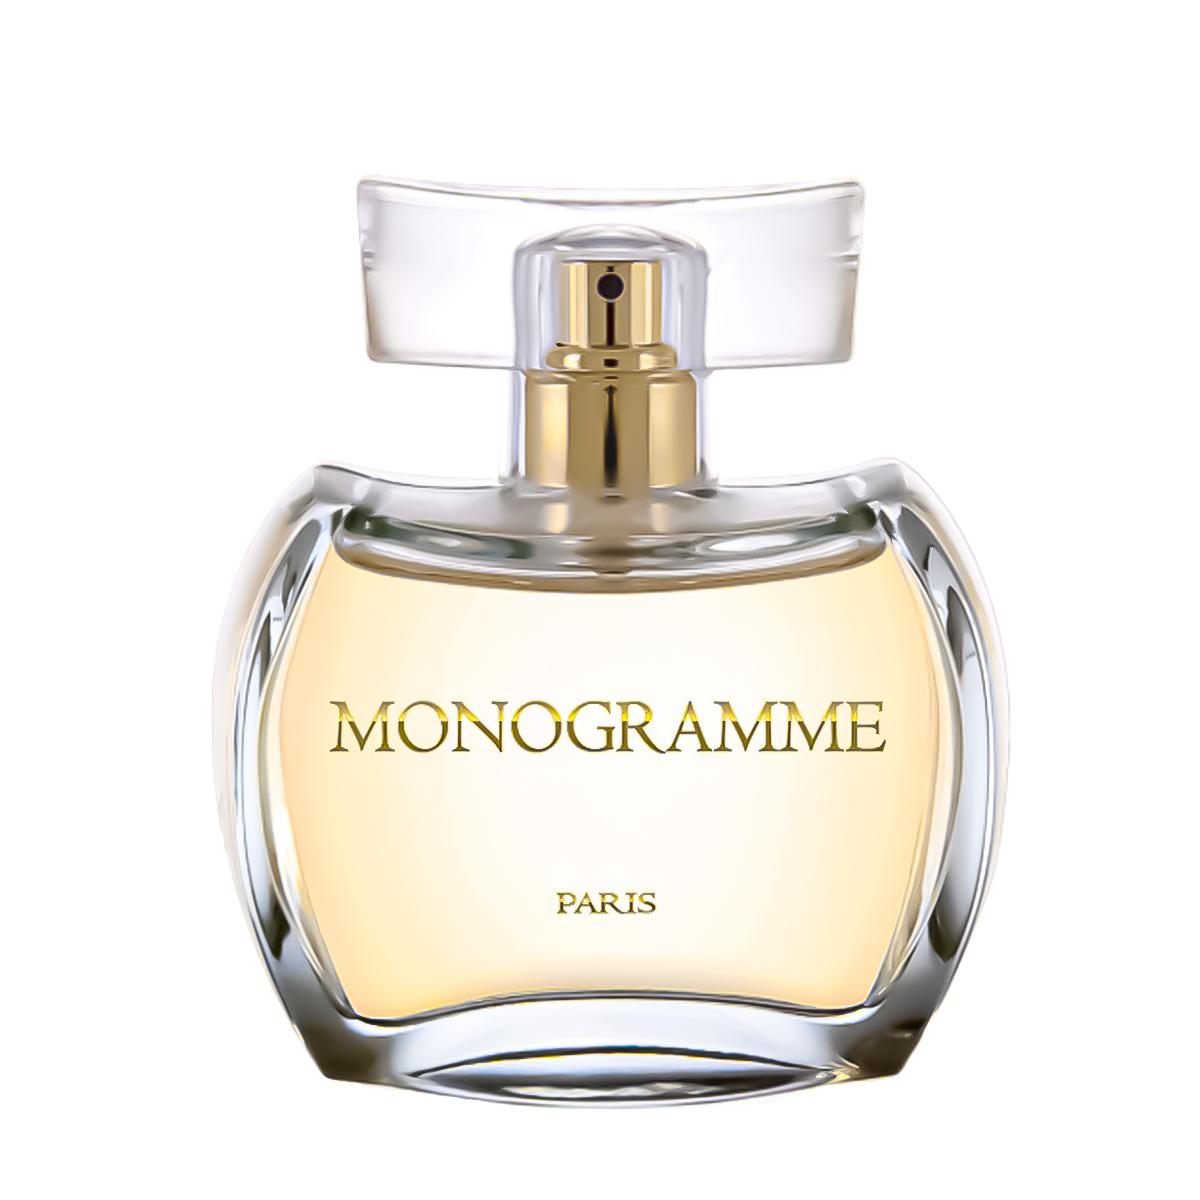 Perfume Monogramme 100ml Feminino Edp Paris Bleu